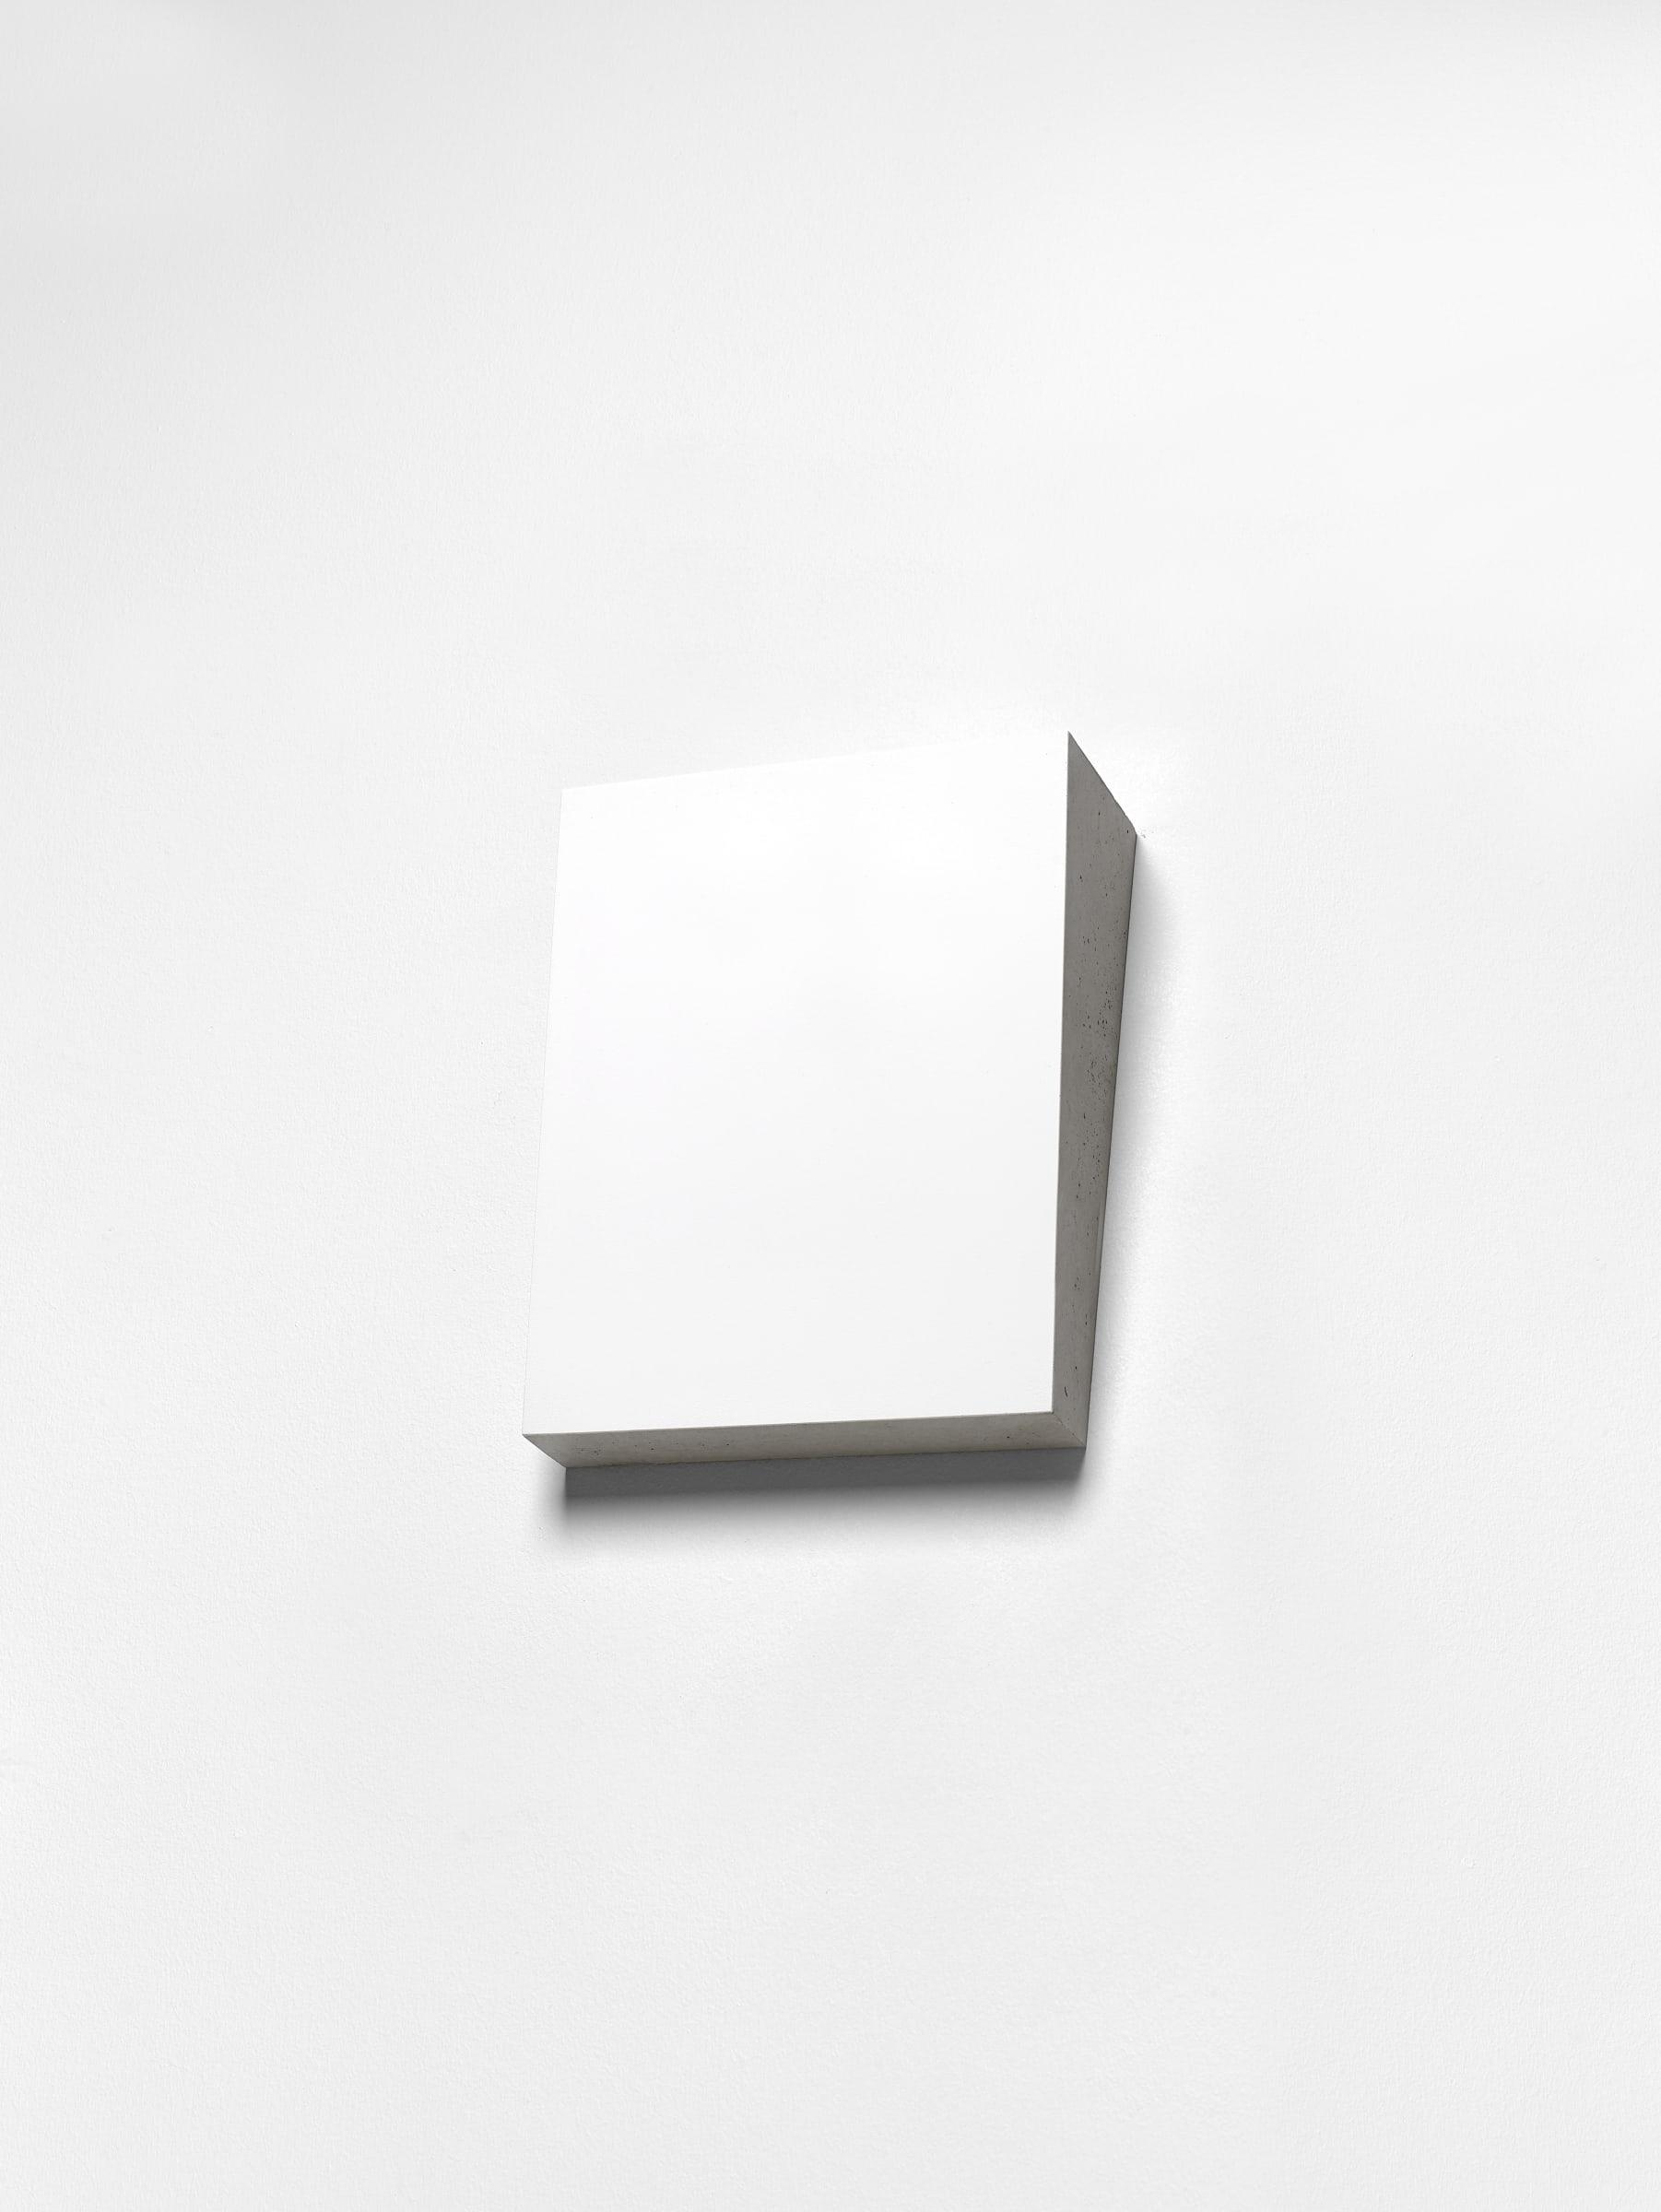 "<span class=""link fancybox-details-link""><a href=""/exhibitions/136/works/artworks13602/"">View Detail Page</a></span><div class=""artist""><strong>INGÓLFUR ARNARSSON</strong></div><div class=""title""><em>Untitled 12</em>, 2013</div><div class=""medium"">concrete, primer, watercolour (white)</div><div class=""dimensions"">30.0 x 25.0 x 10.0 cm<br>11 3/4 x 9 13/16 x 3 7/8 in</div><div class=""edition_details""></div>"